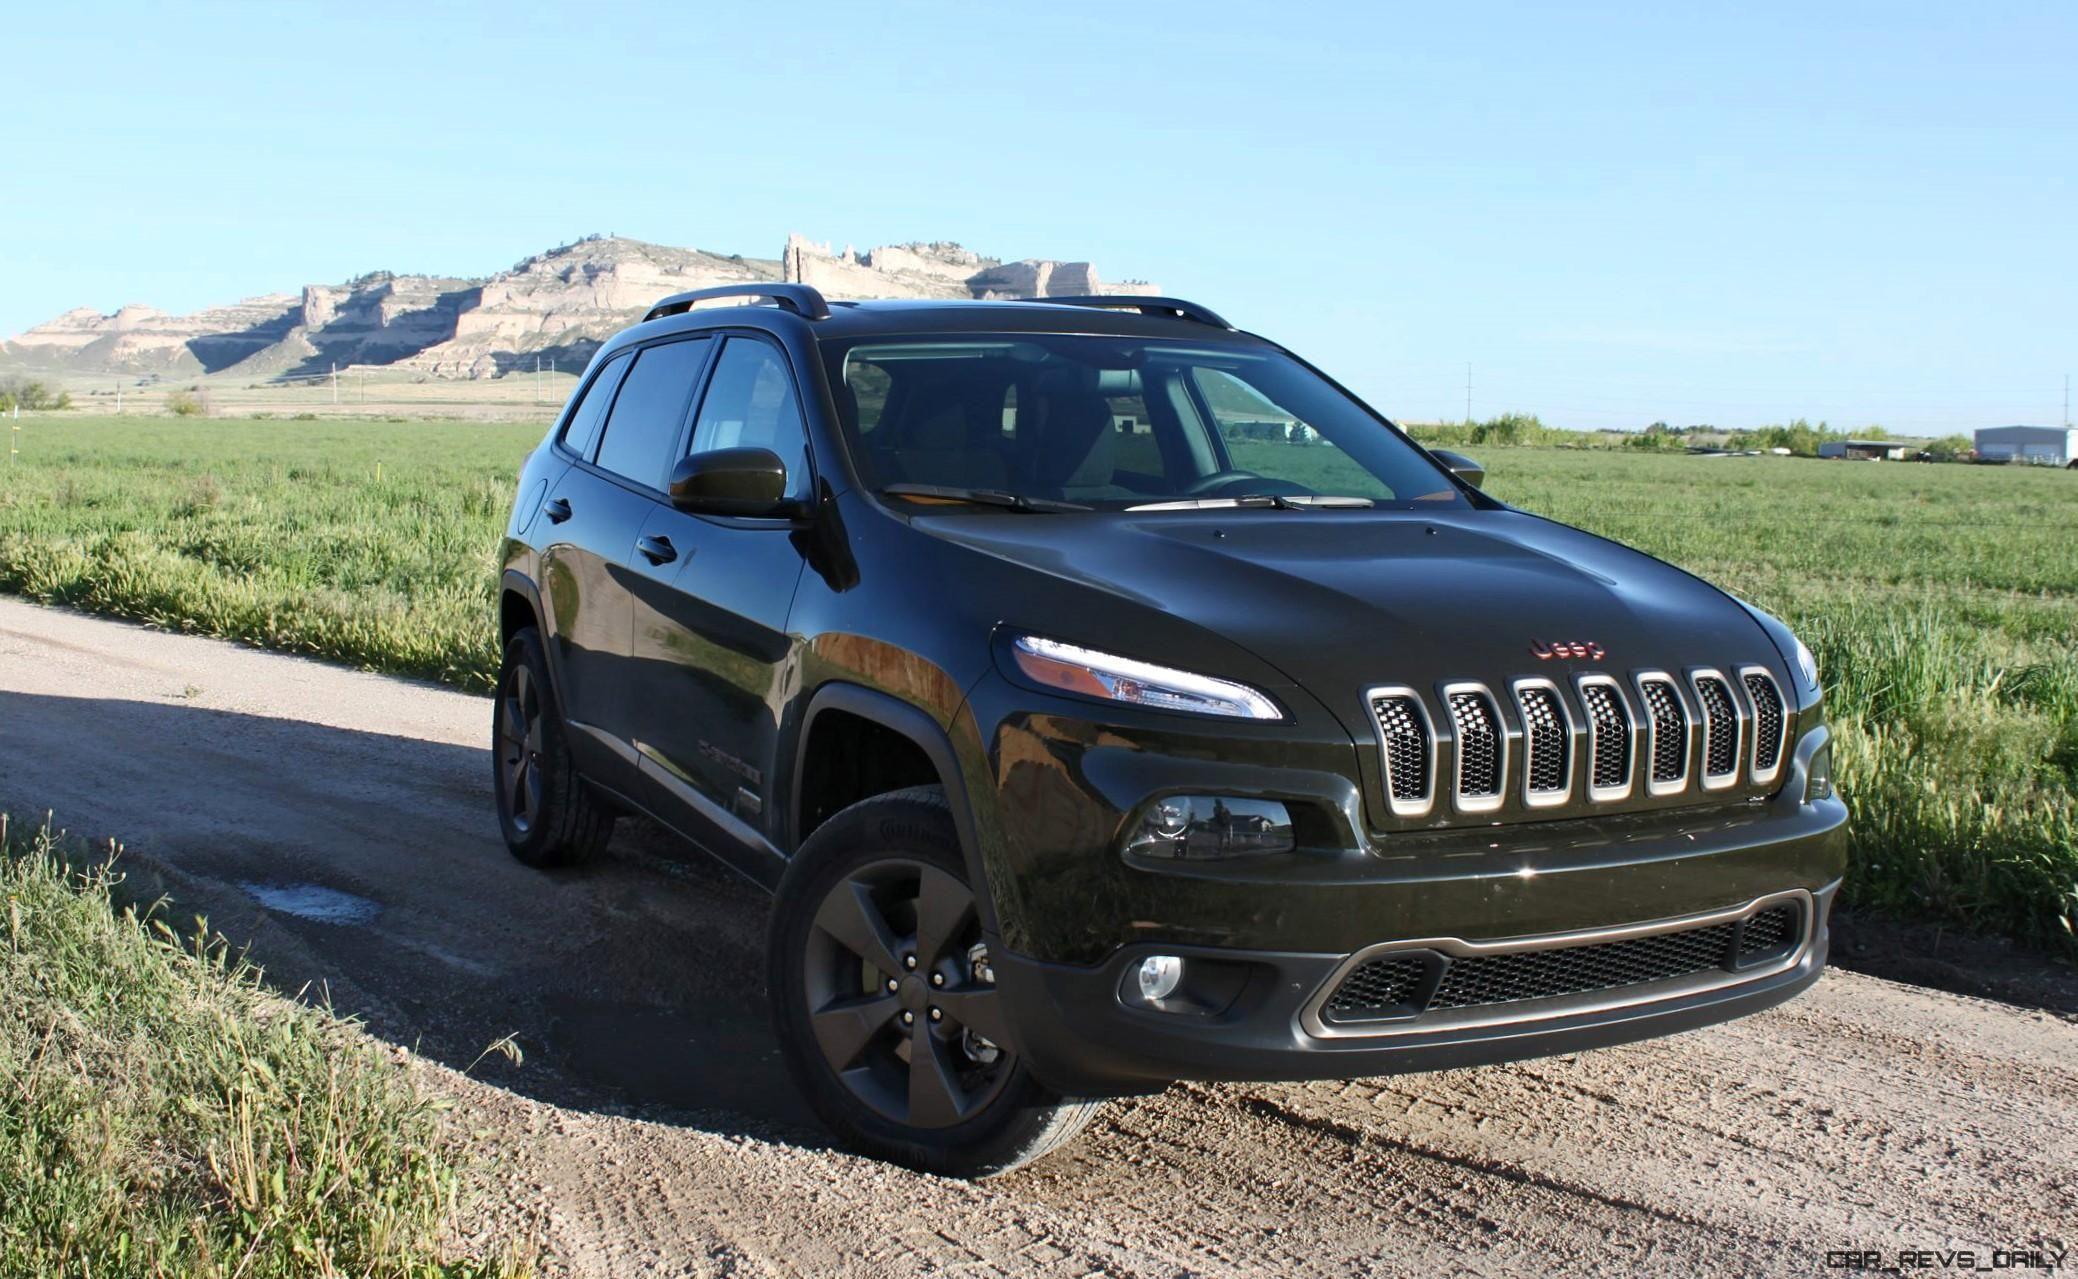 2016 Jeep Cherokee Latitude 75th Anniversary Edition Review By Tim Esterdahl Customs Car Revs Daily Com Jeep Cherokee Chevrolet Volt Jeep